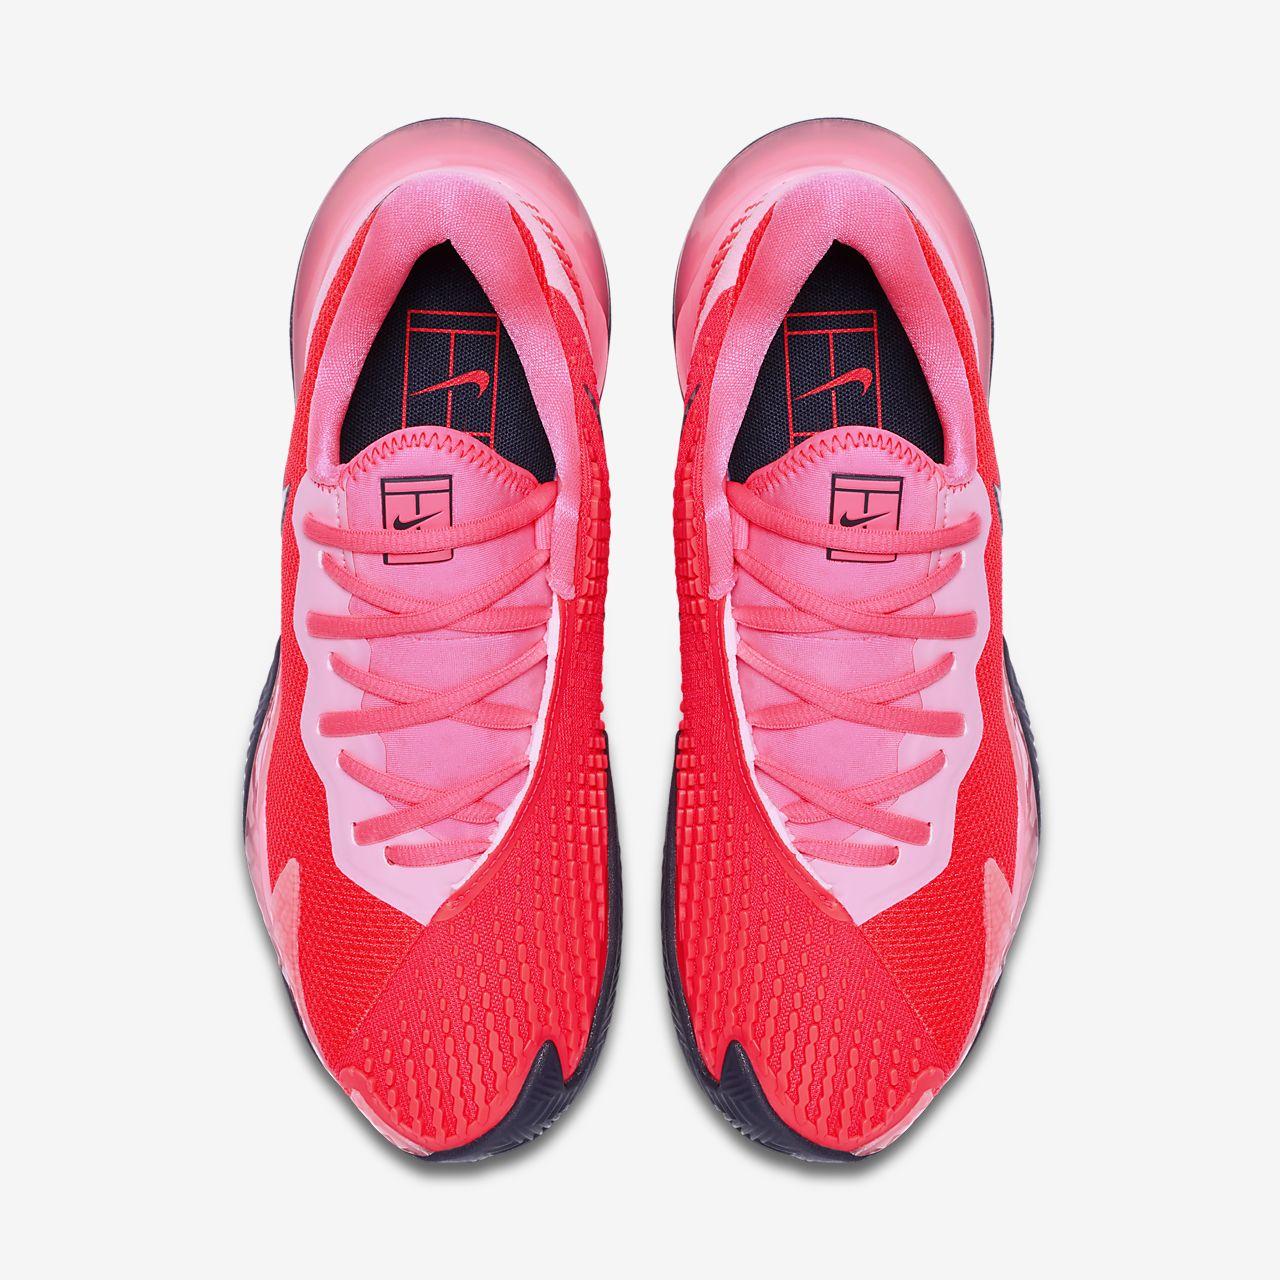 Scarpa da tennis per campi in terra rossa NikeCourt Air Zoom Vapor Cage 4 Donna